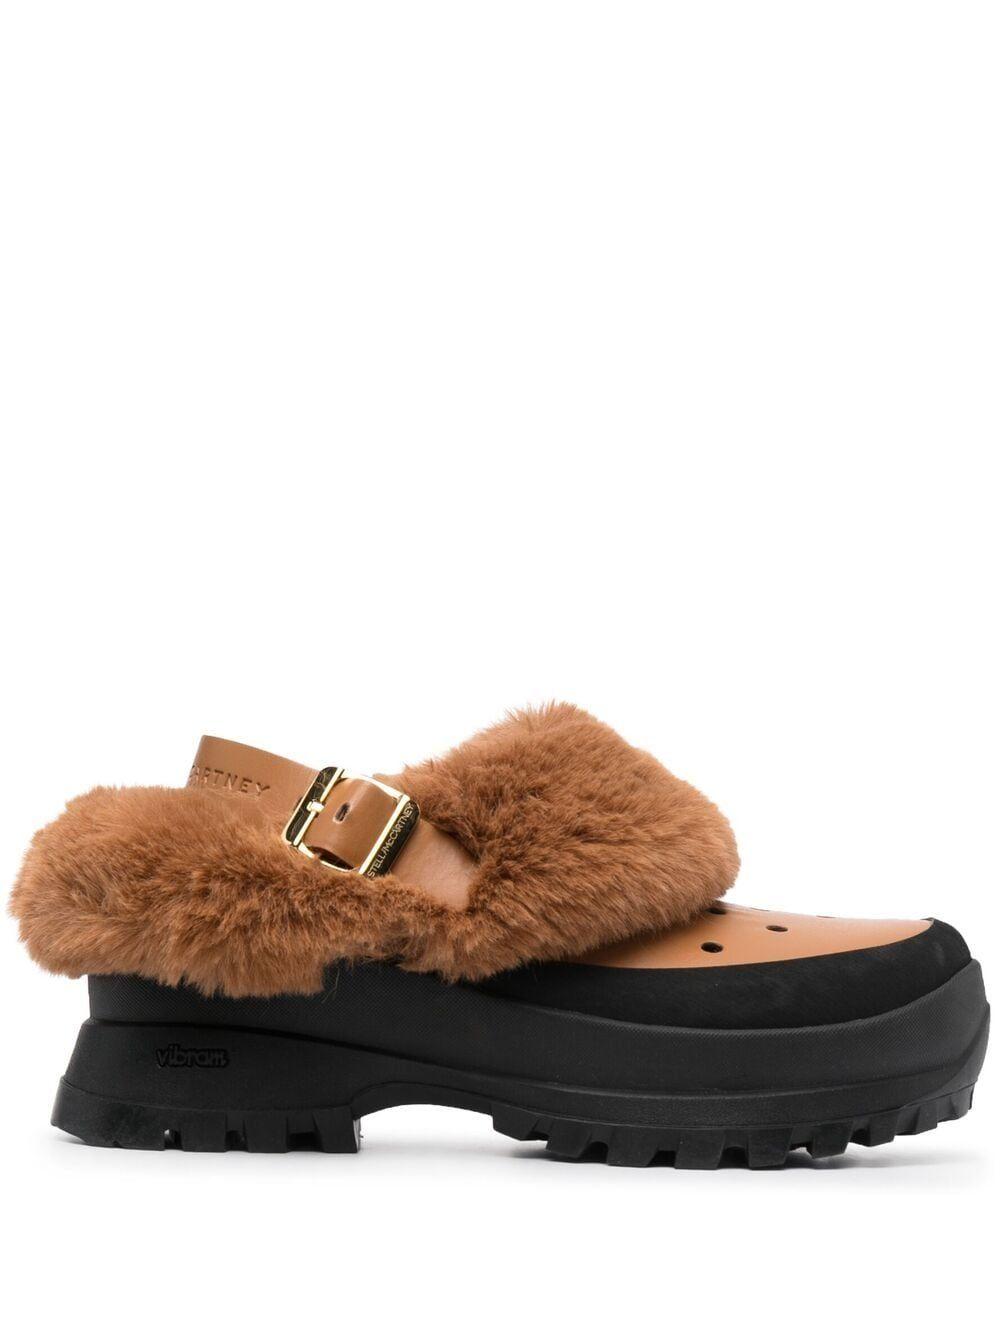 Sandalo trace